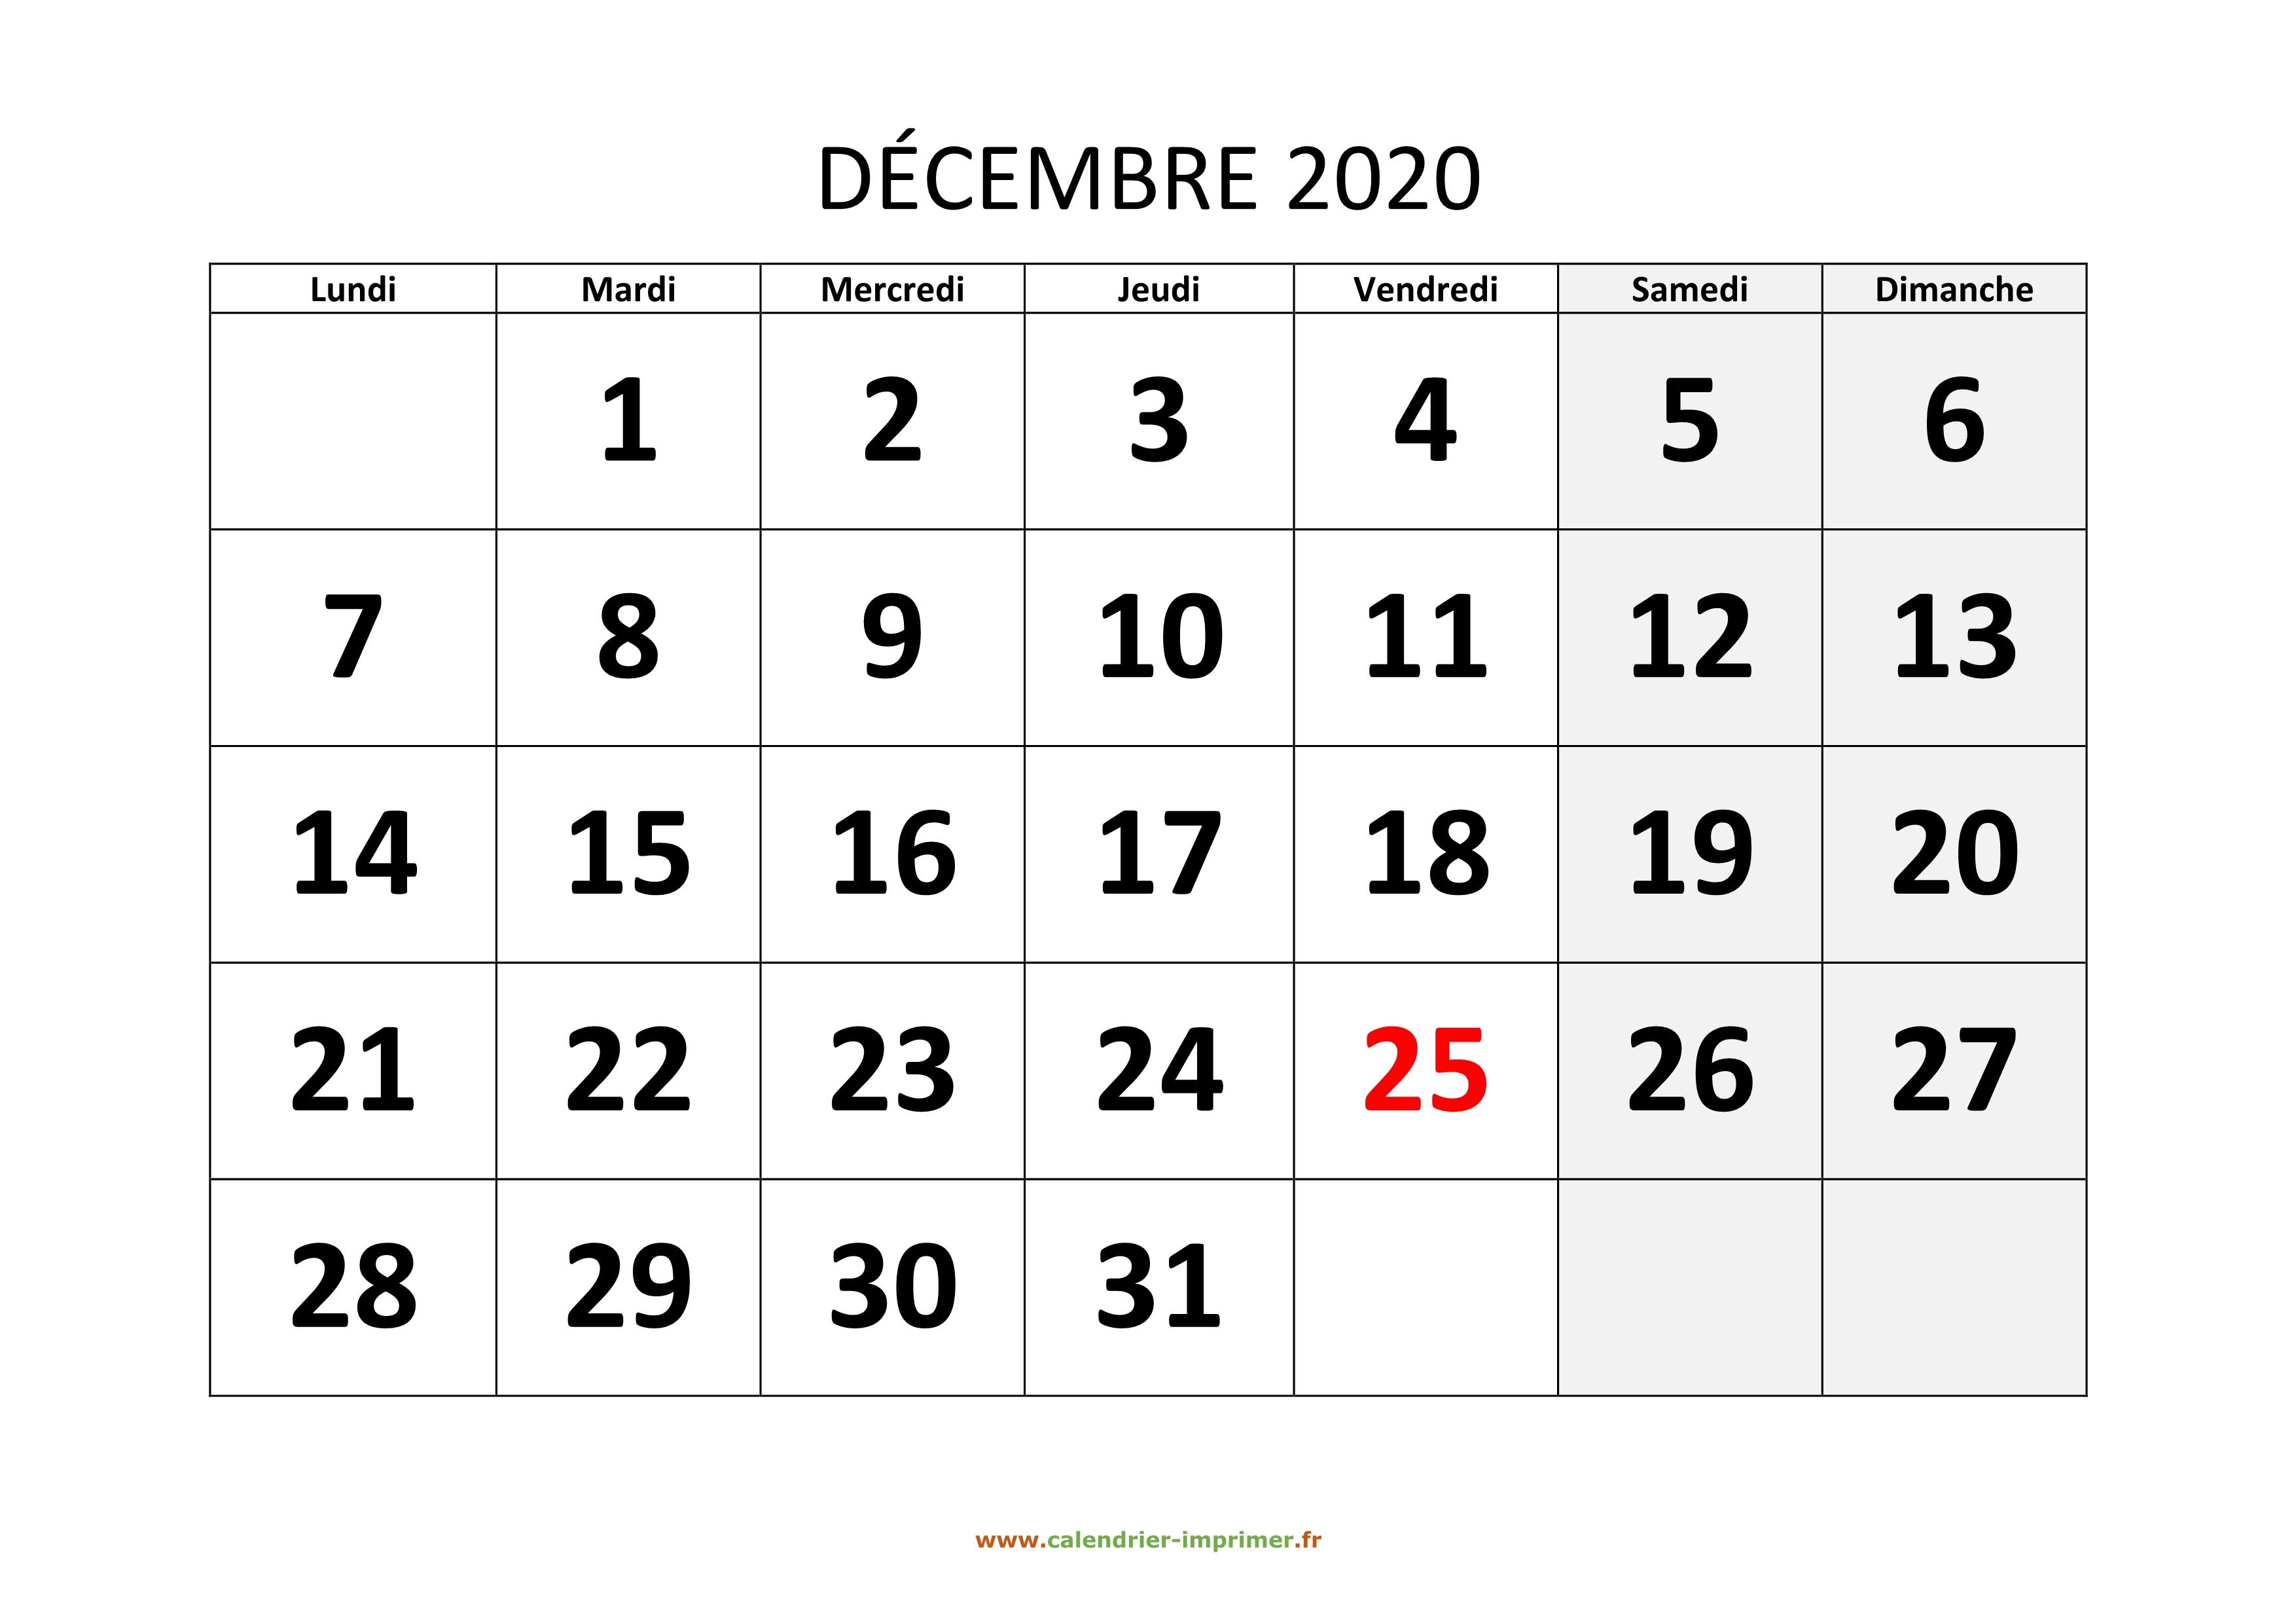 Calendrier Decembre 2020.Calendrier Decembre 2020 A Imprimer